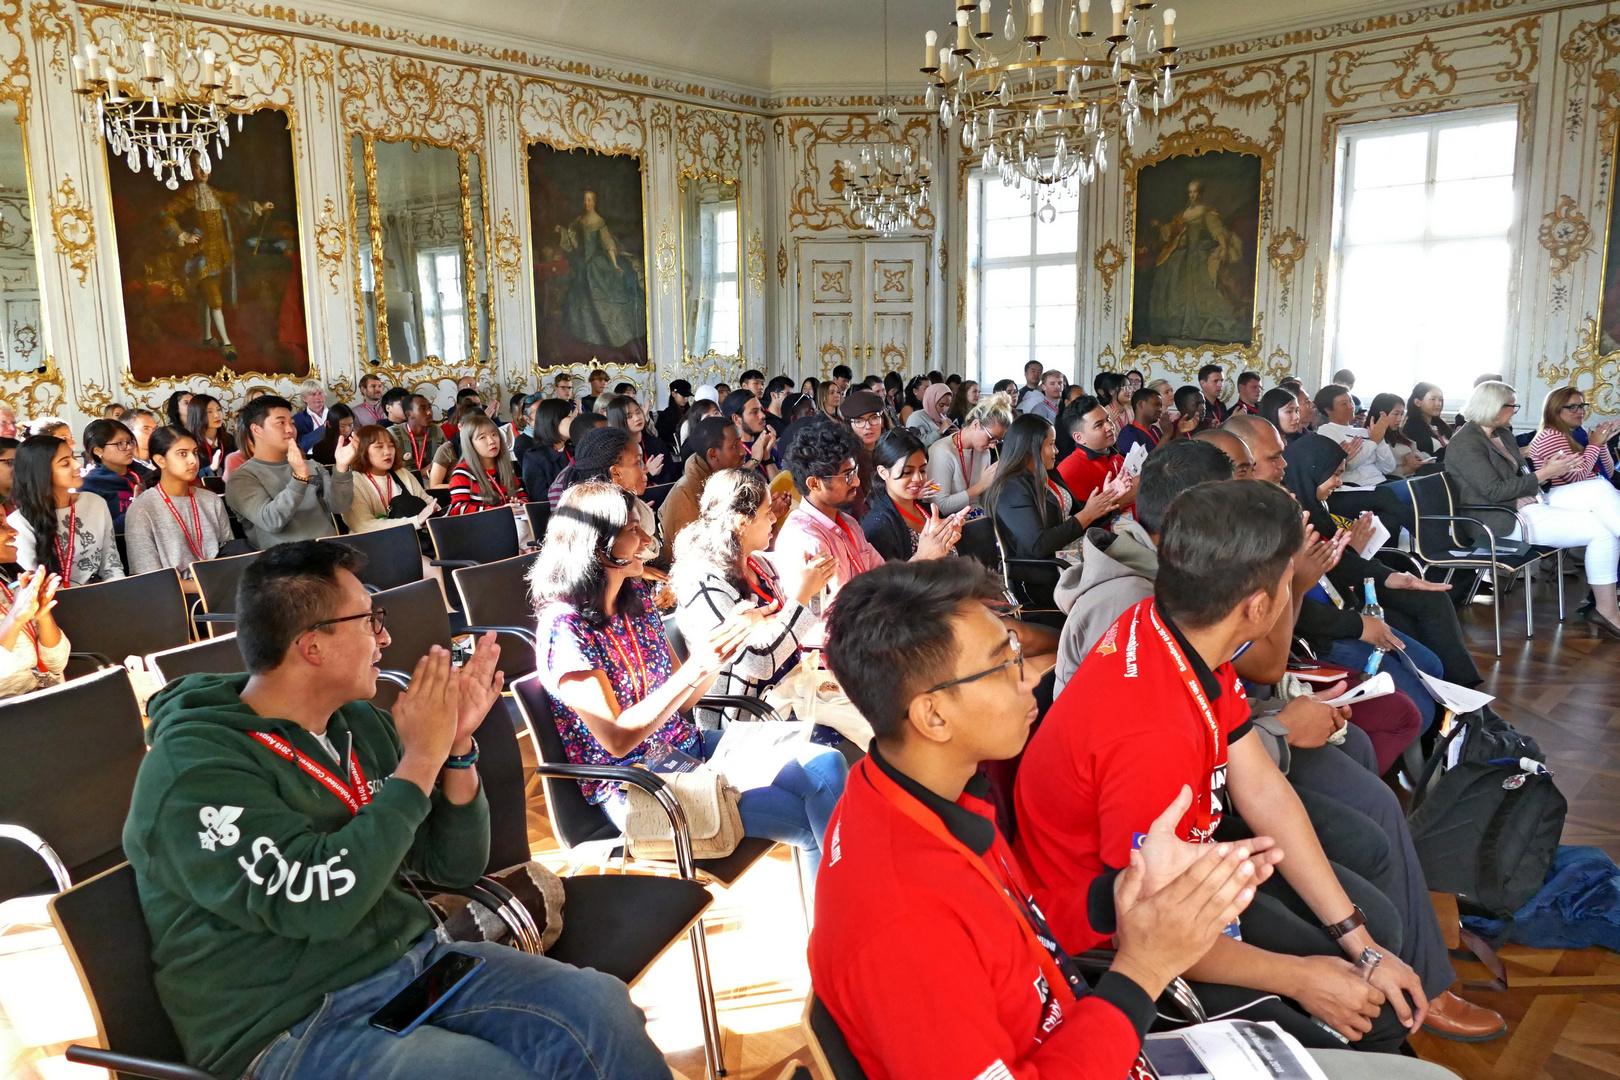 Welt-Jugendfreiwilligenforum 2018 Augsburg / Deutschland - 17.10.2018 Rokokosaal - Foto: Christoph Urban - Freiwilligen-Zentrum Augsburg